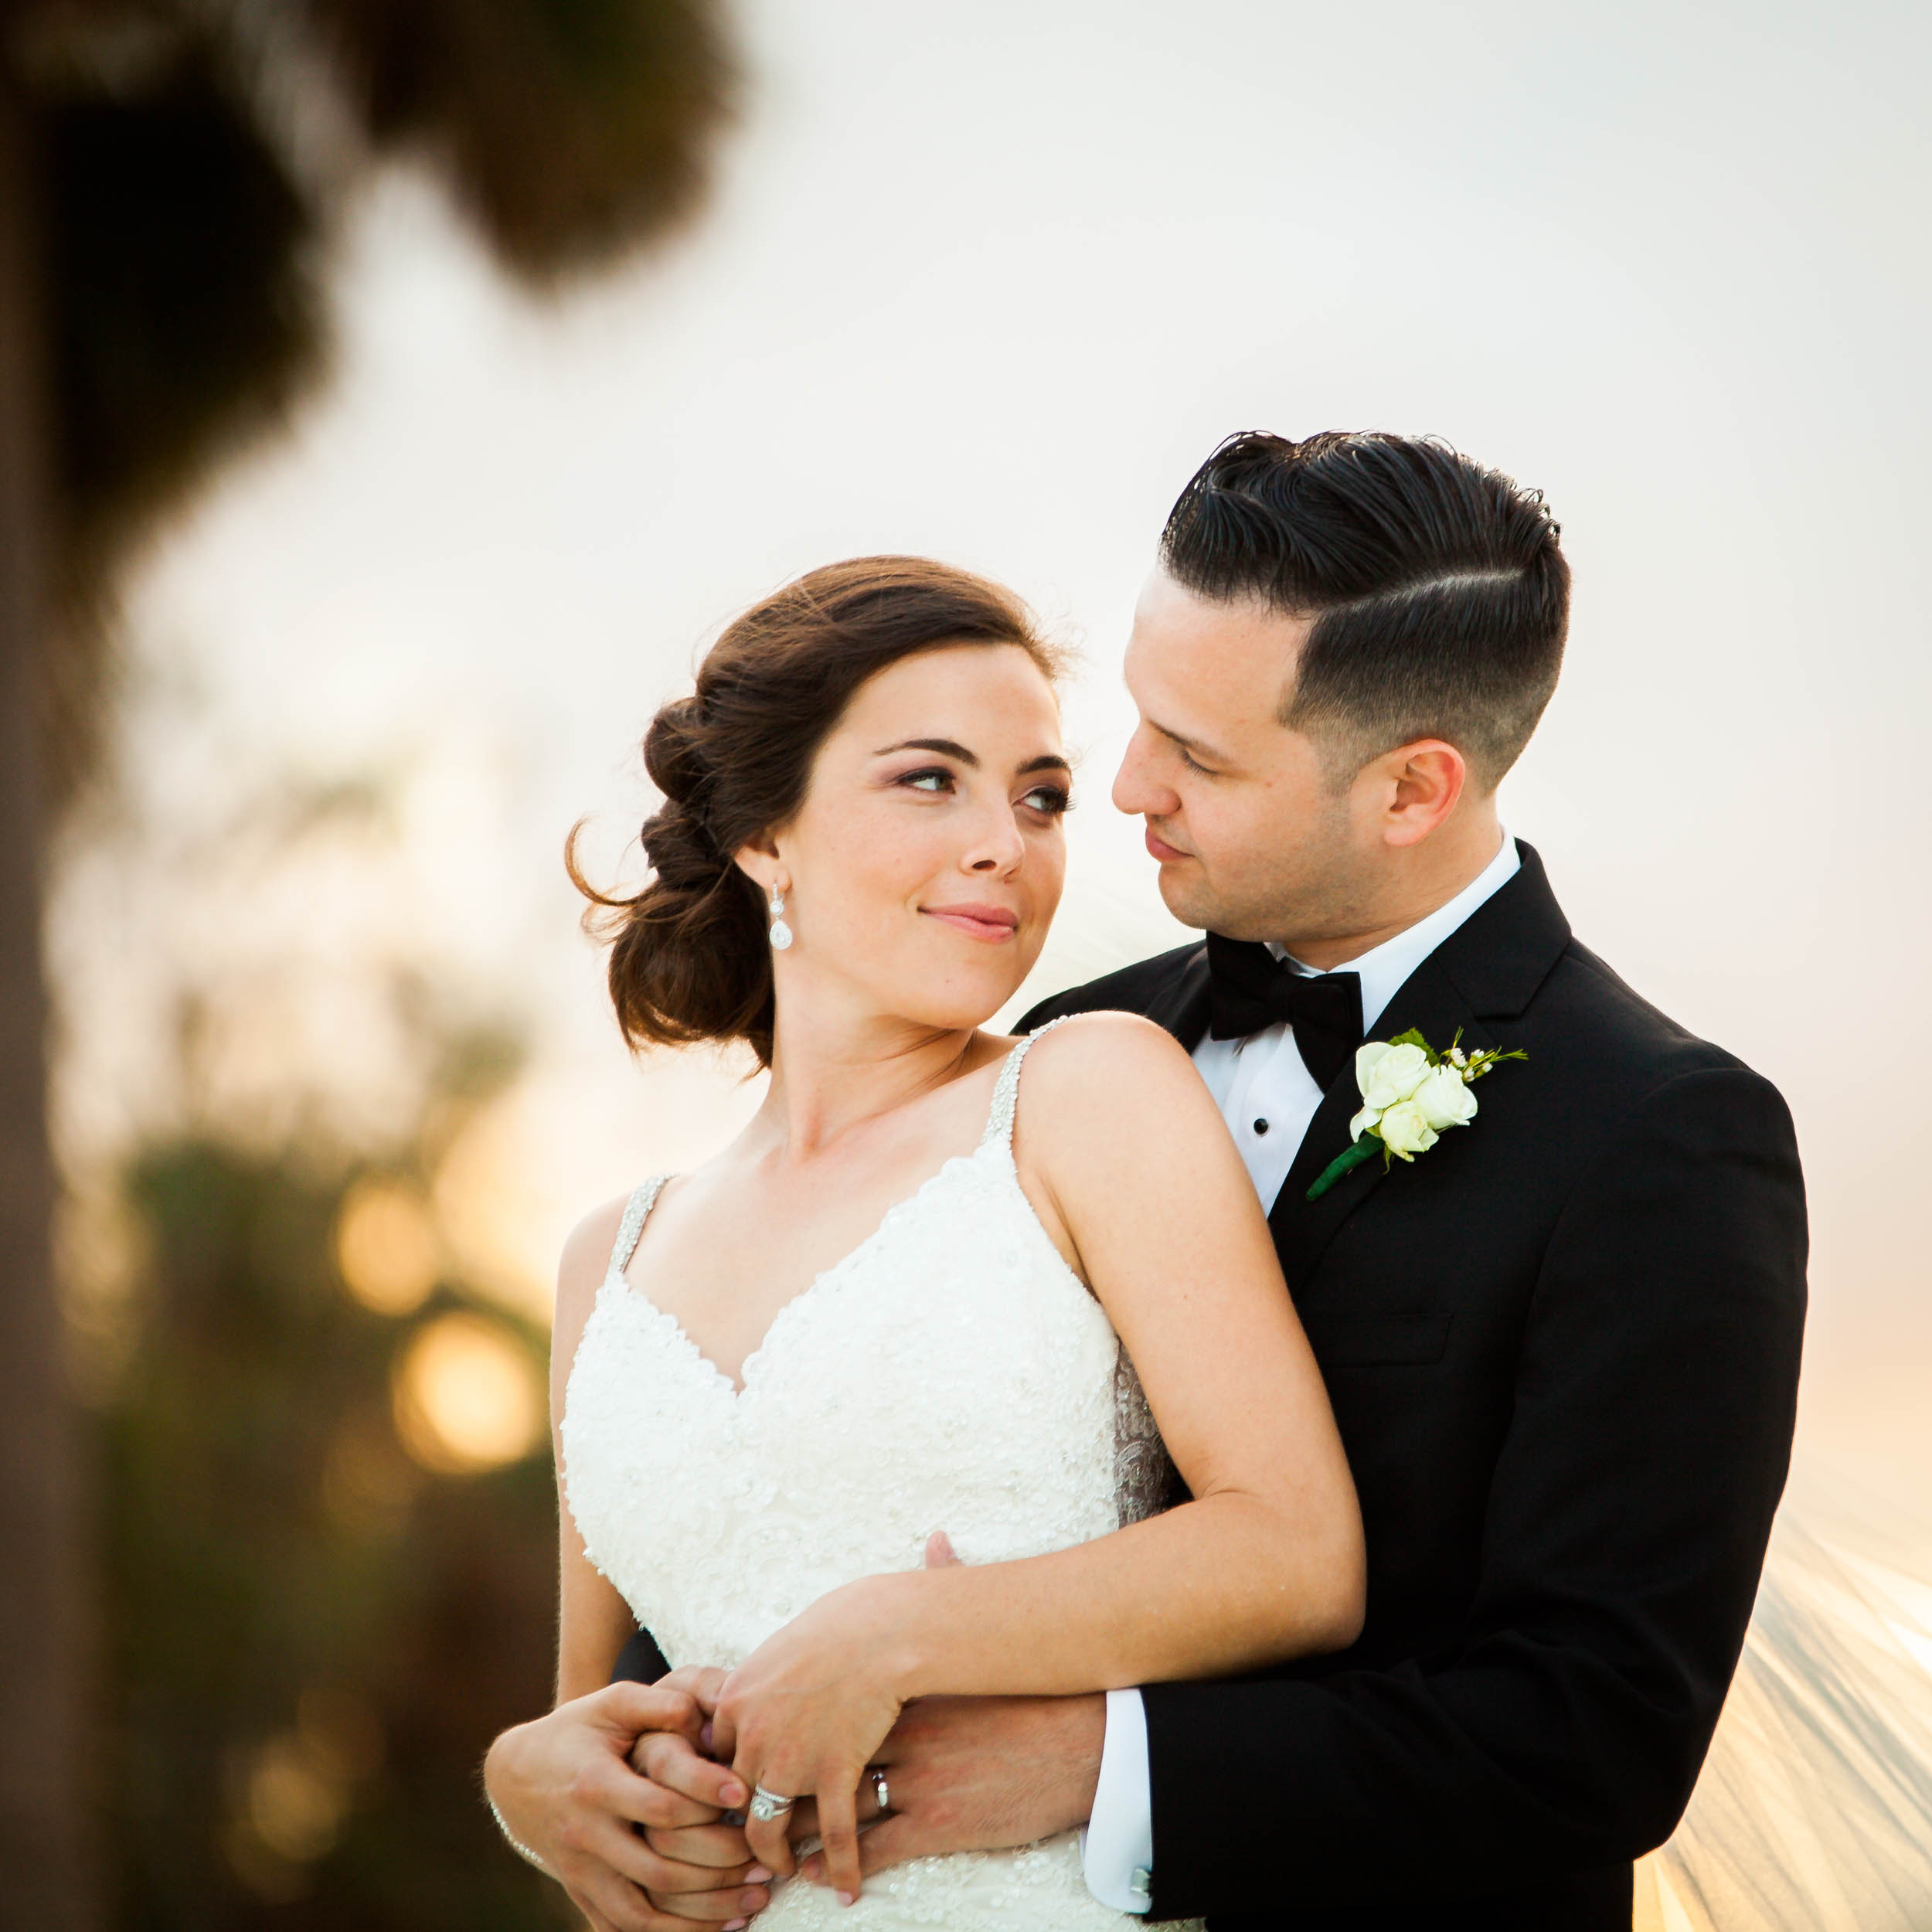 Flordia-Wedding-Photography-50.jpg